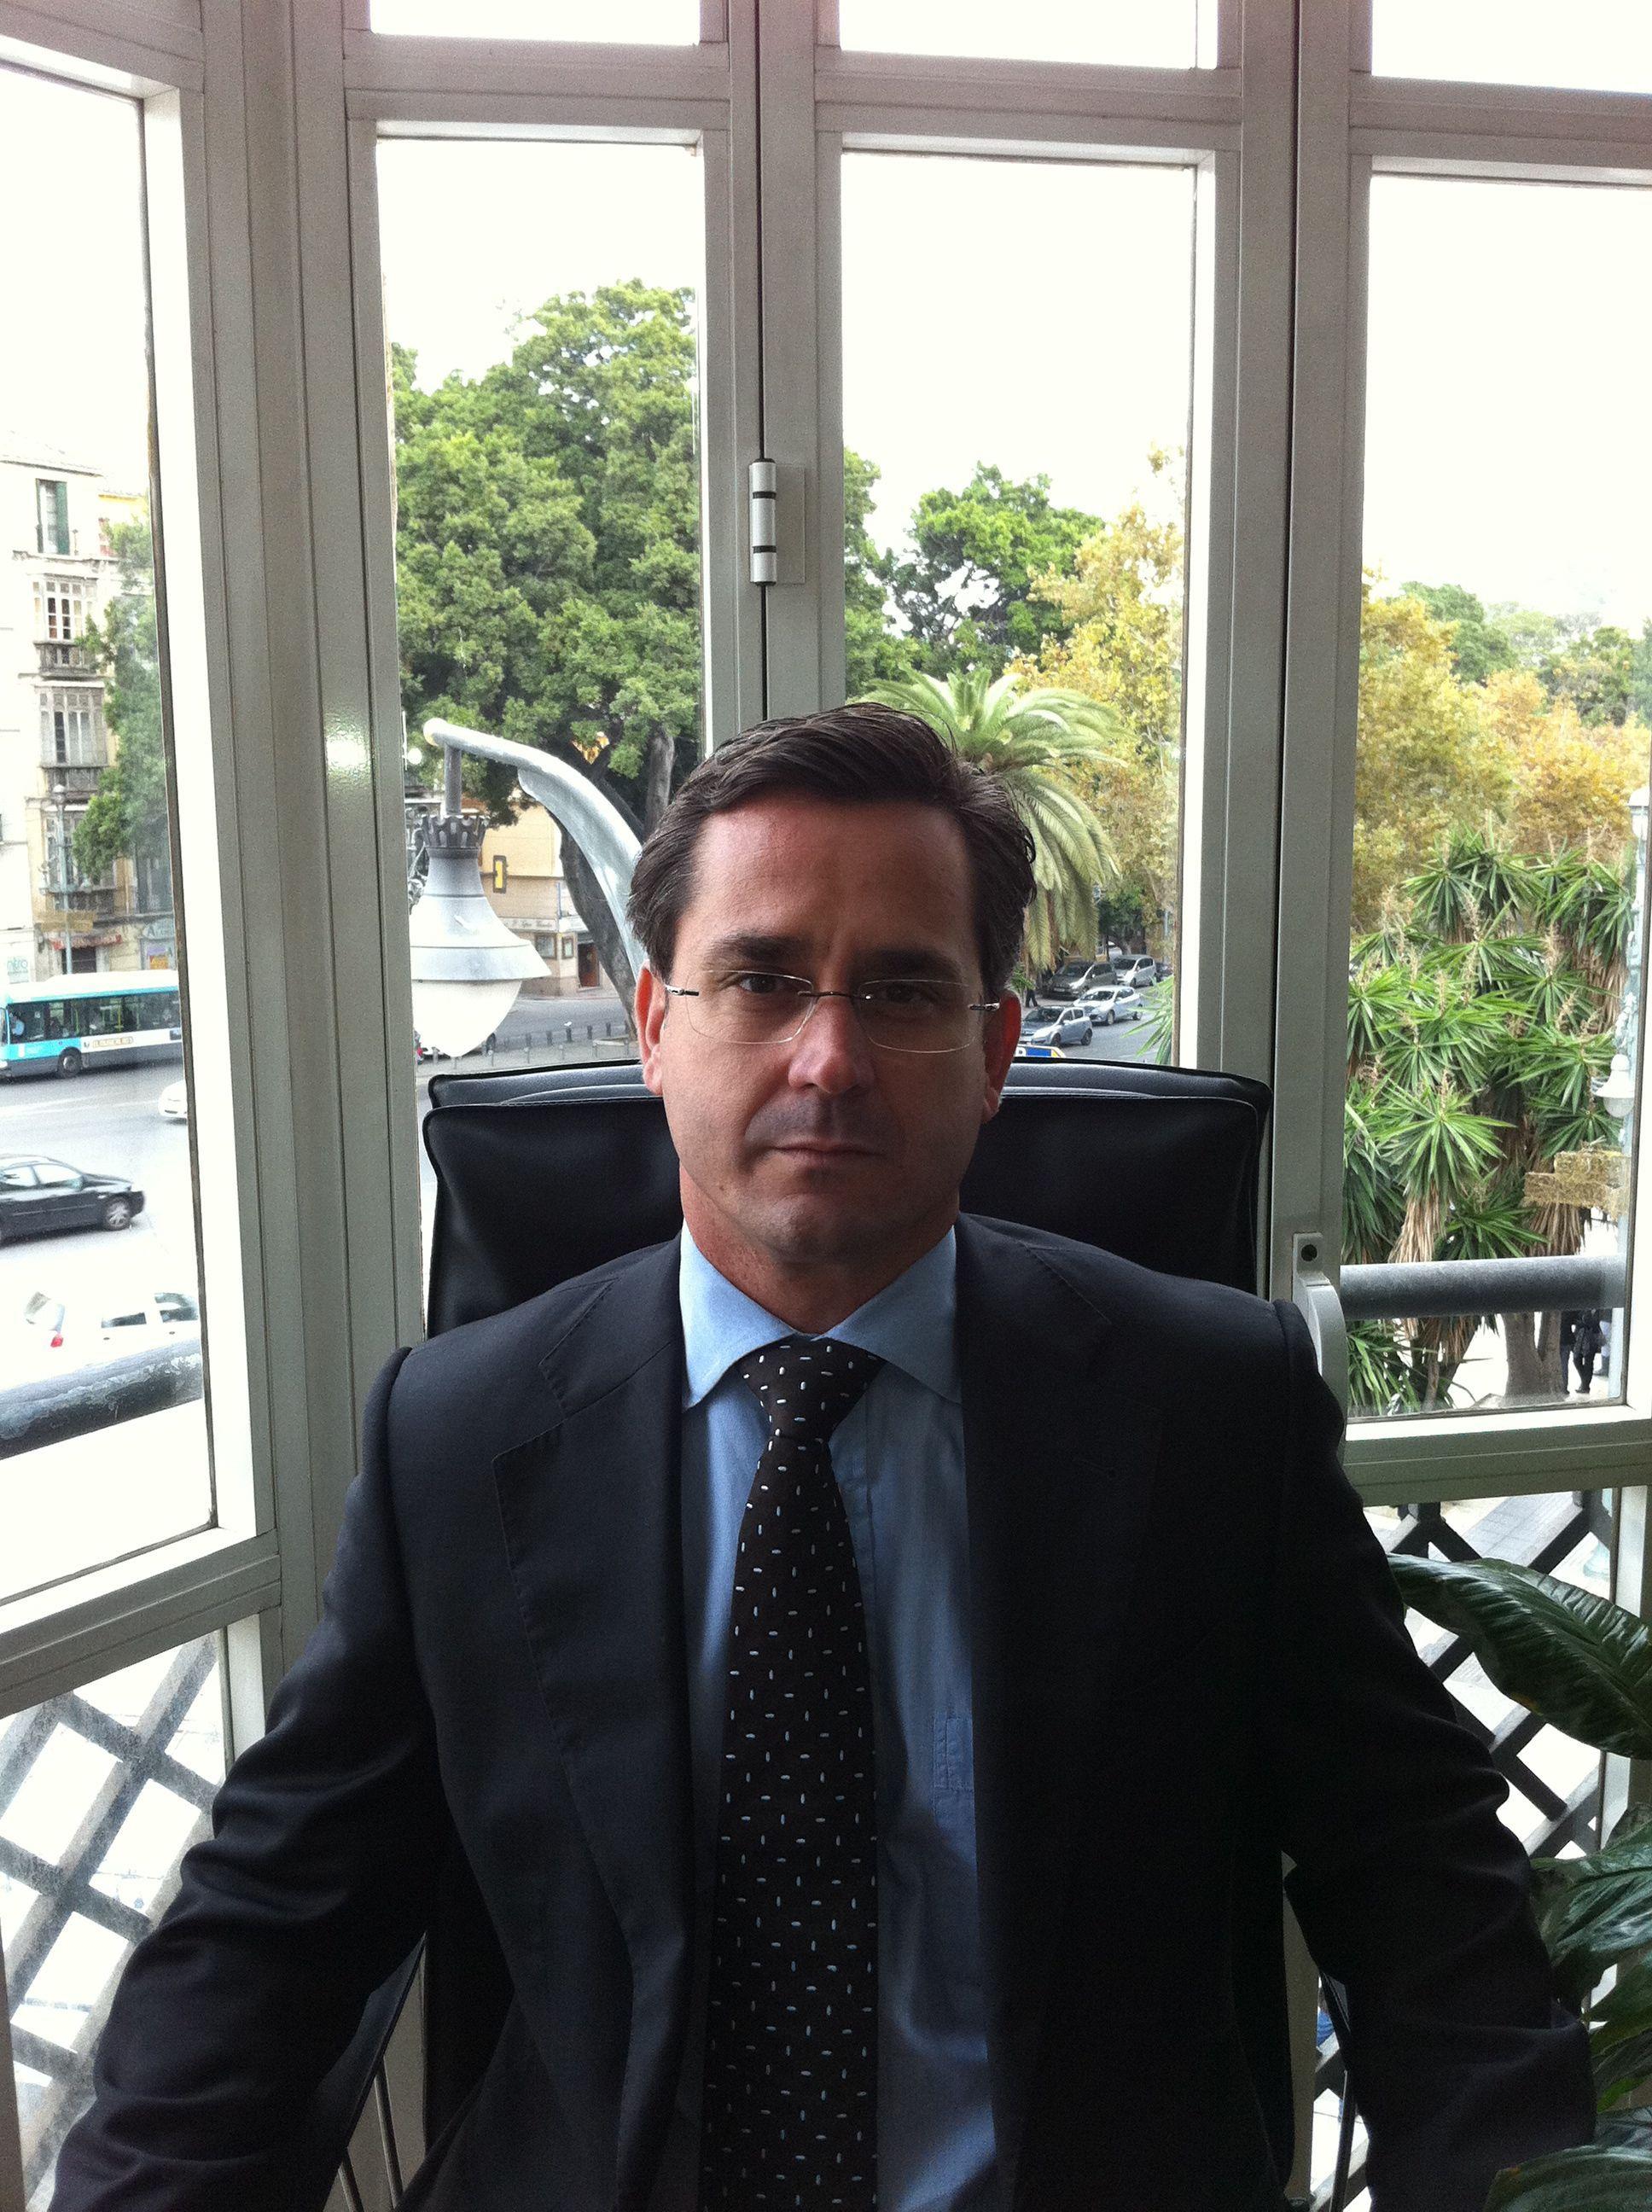 Fco. Javier Roji Fernandez abogado